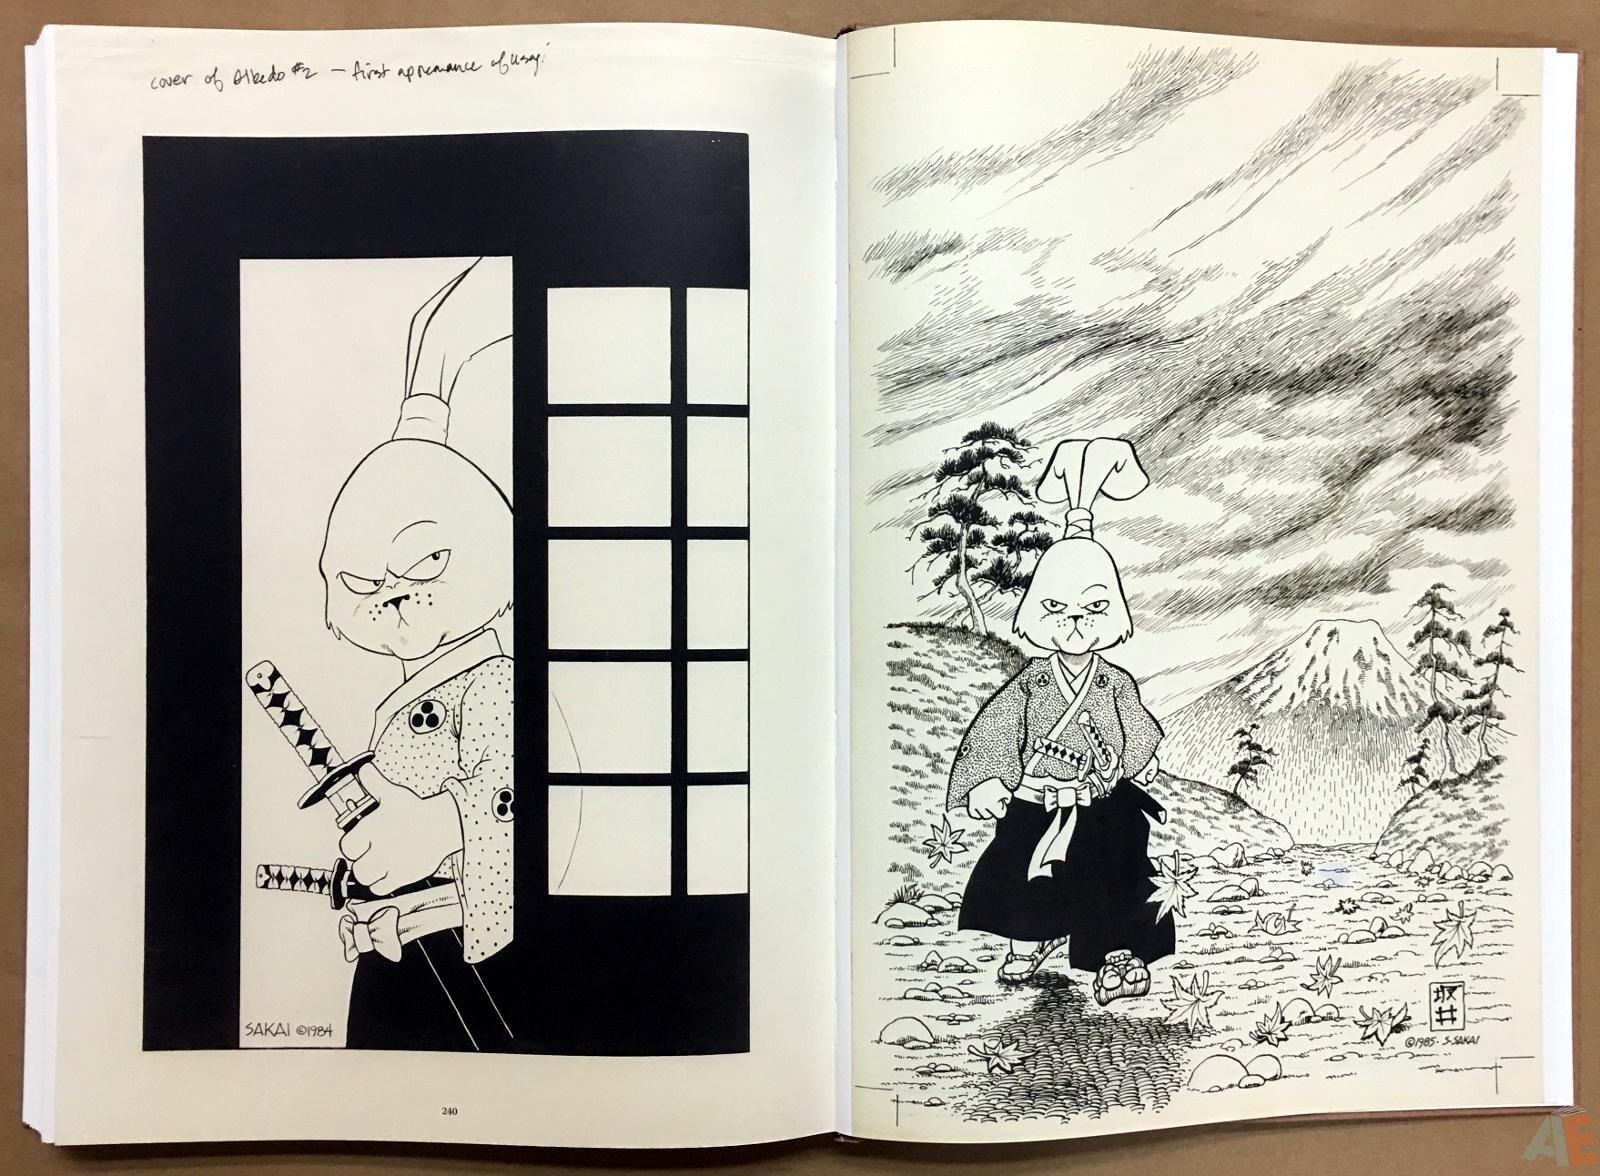 Usagi Yojimbo: Samurai and Other Stories Gallery Edition 44